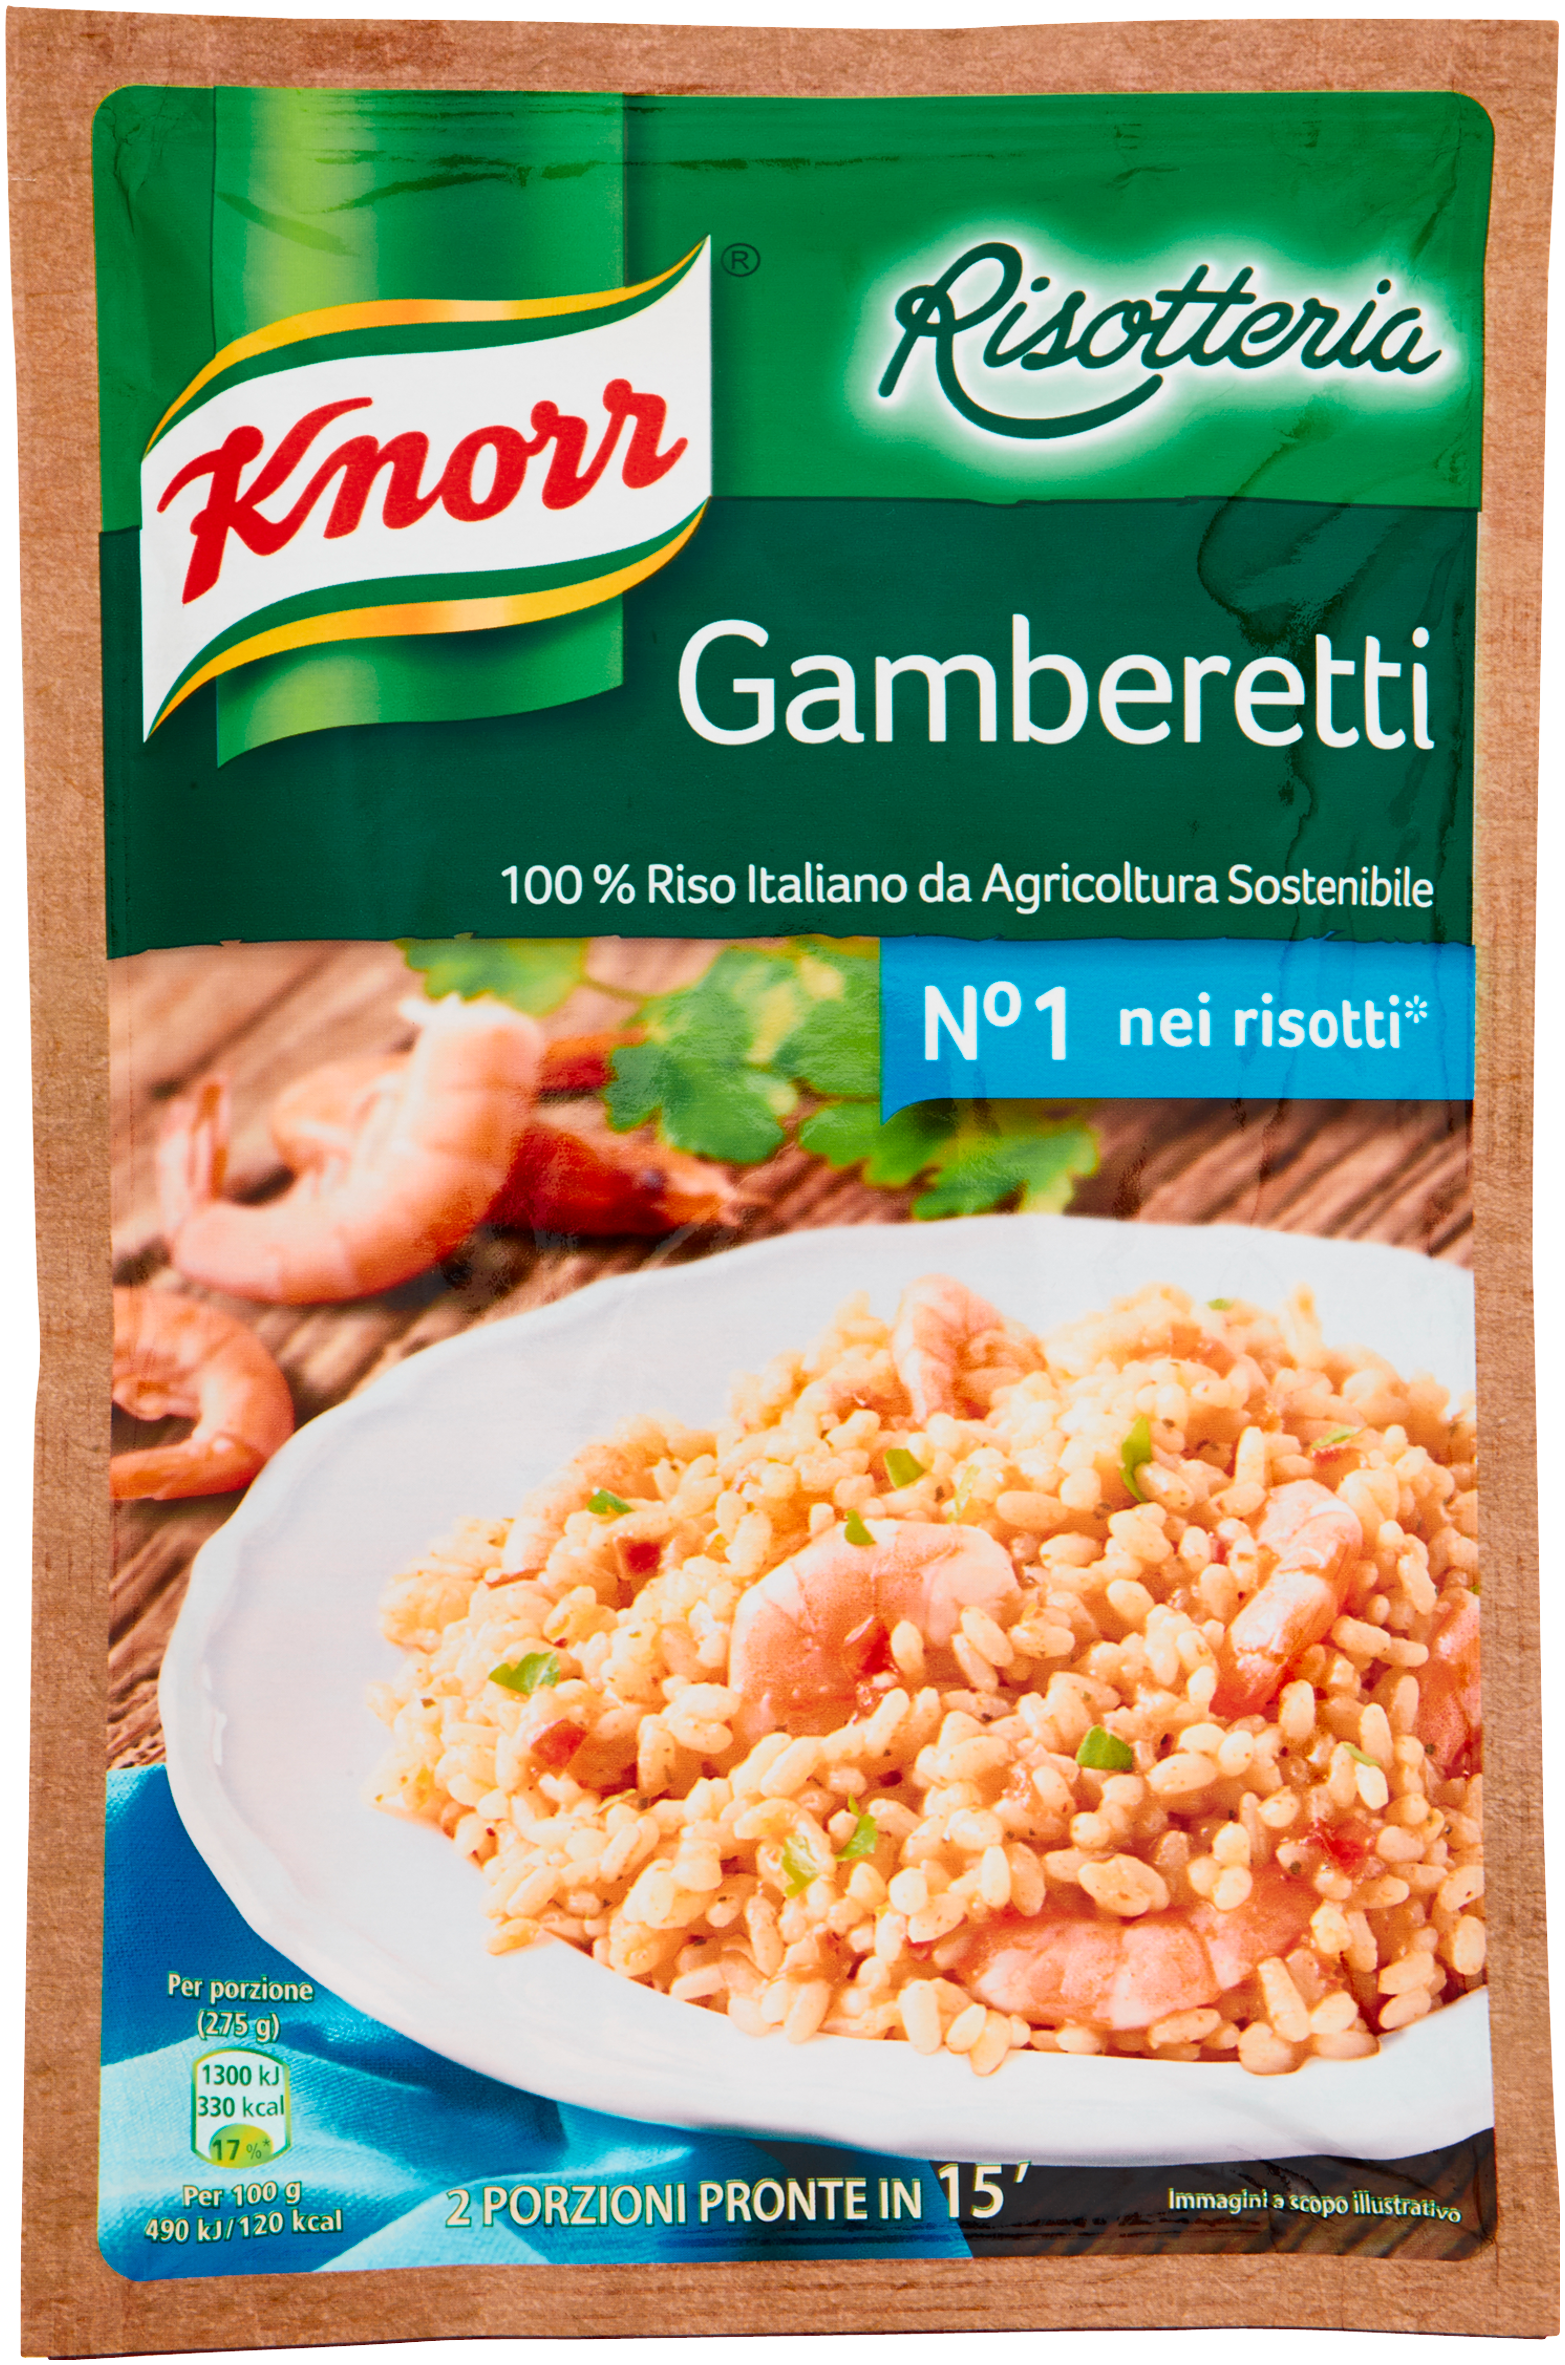 Knorr Risotteria Gamberetti 175 g